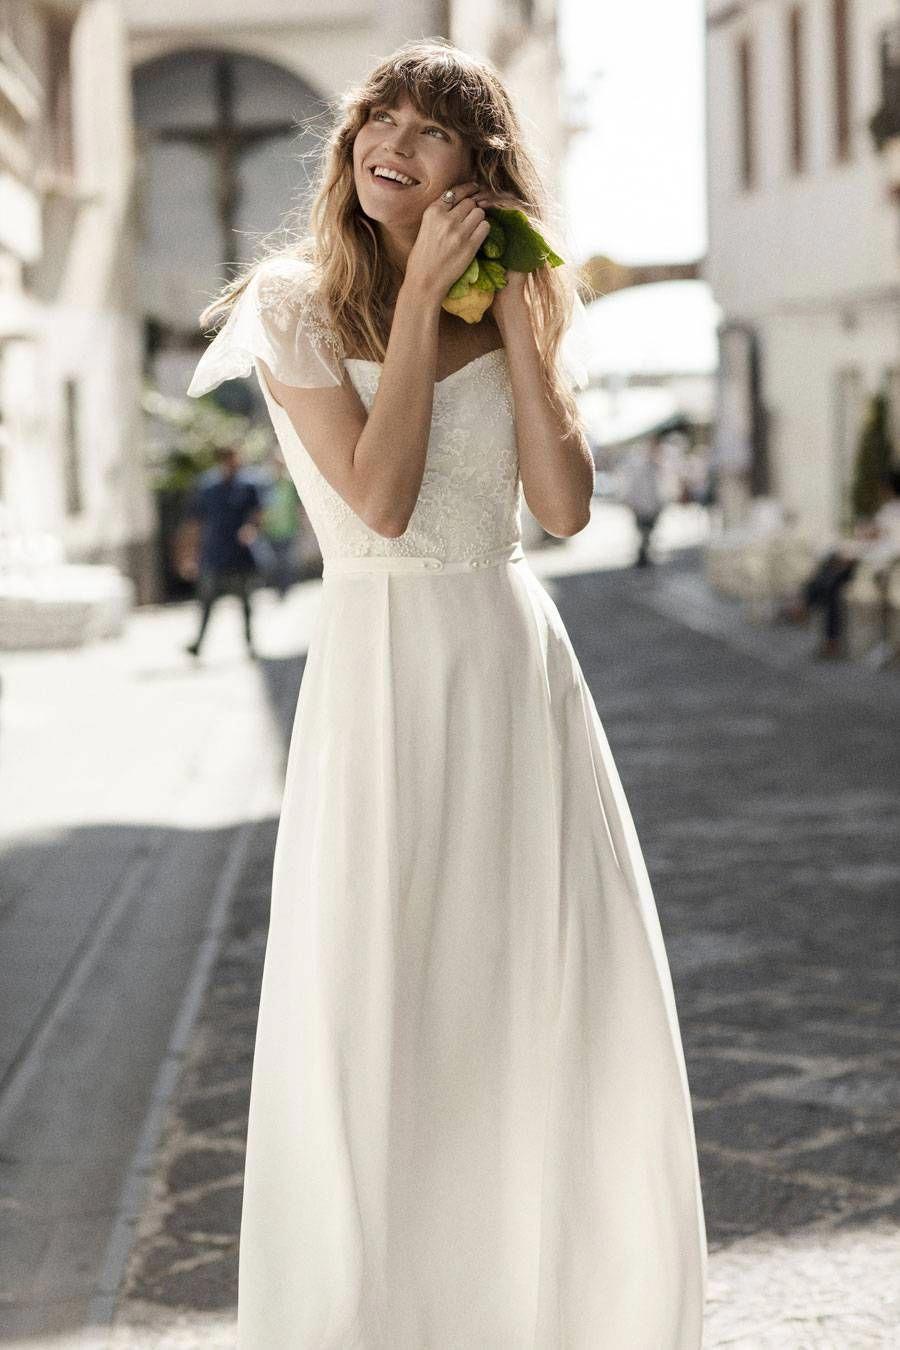 422a8165fa Italian Stories! The Herbarium 2018 Wedding Dress Collection by Warsaw Poet   italianweddingdress